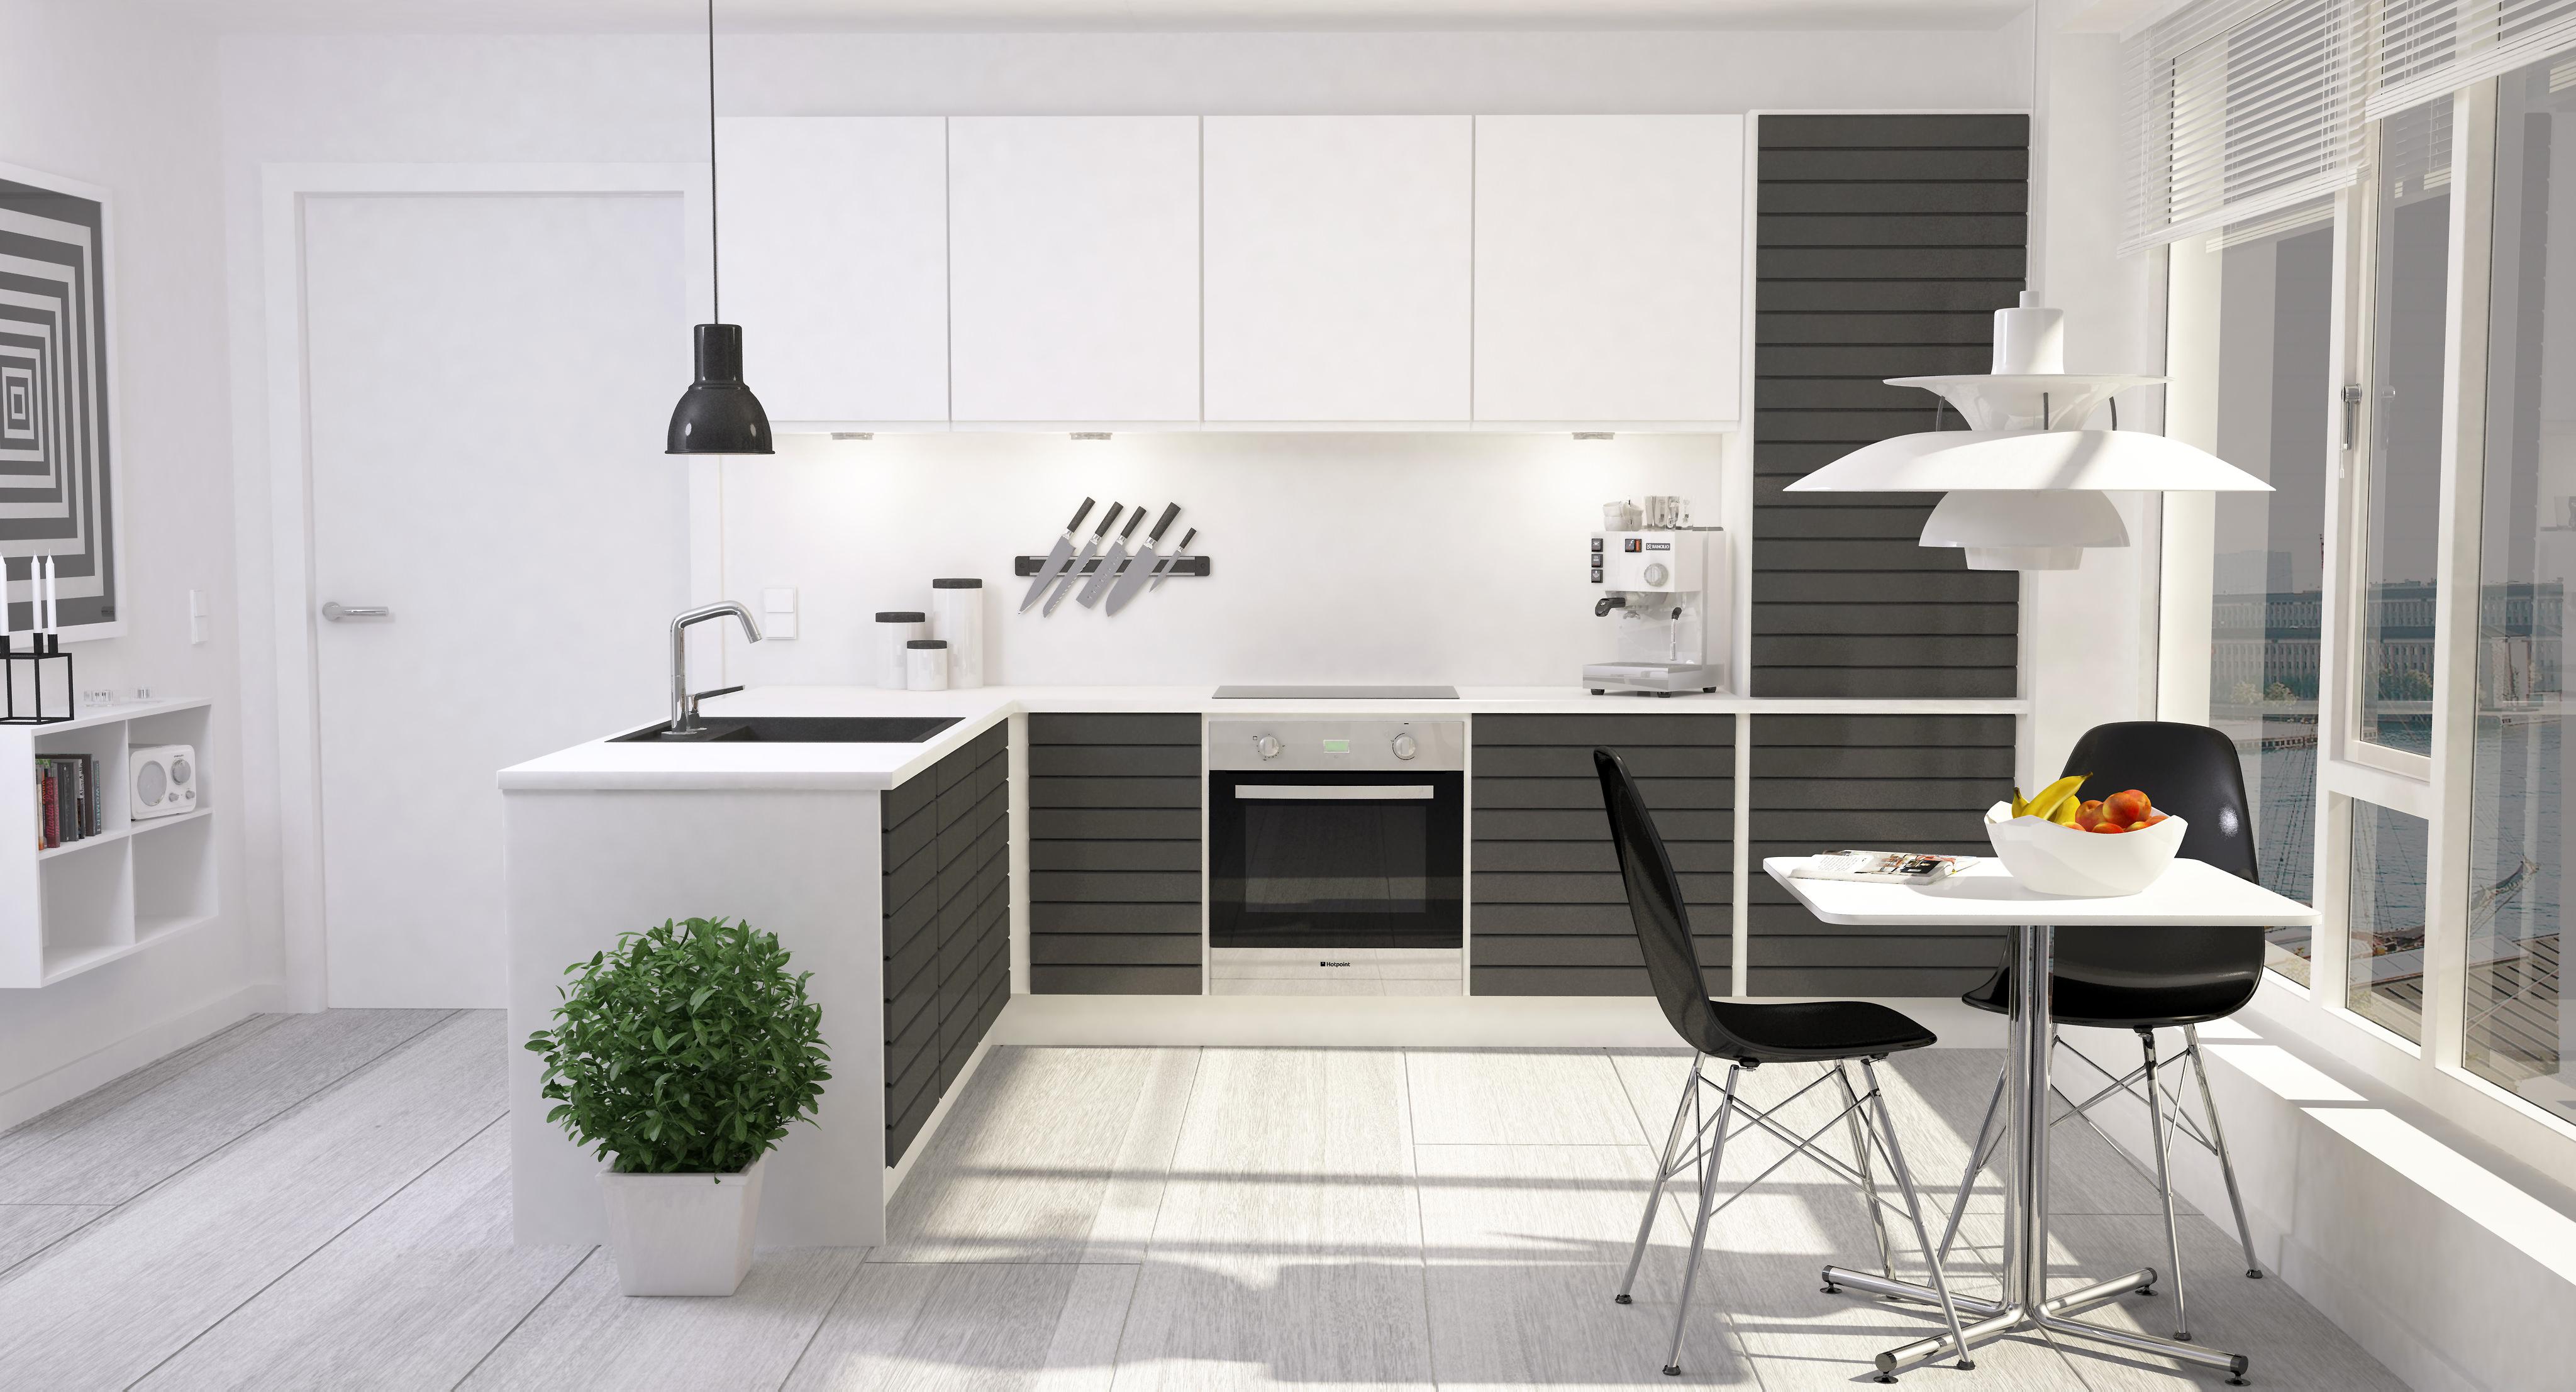 Modern Kitchen Interior 001 3D Model .max .obj .fbx .dxf ... on Model Kitchen Design  id=64929